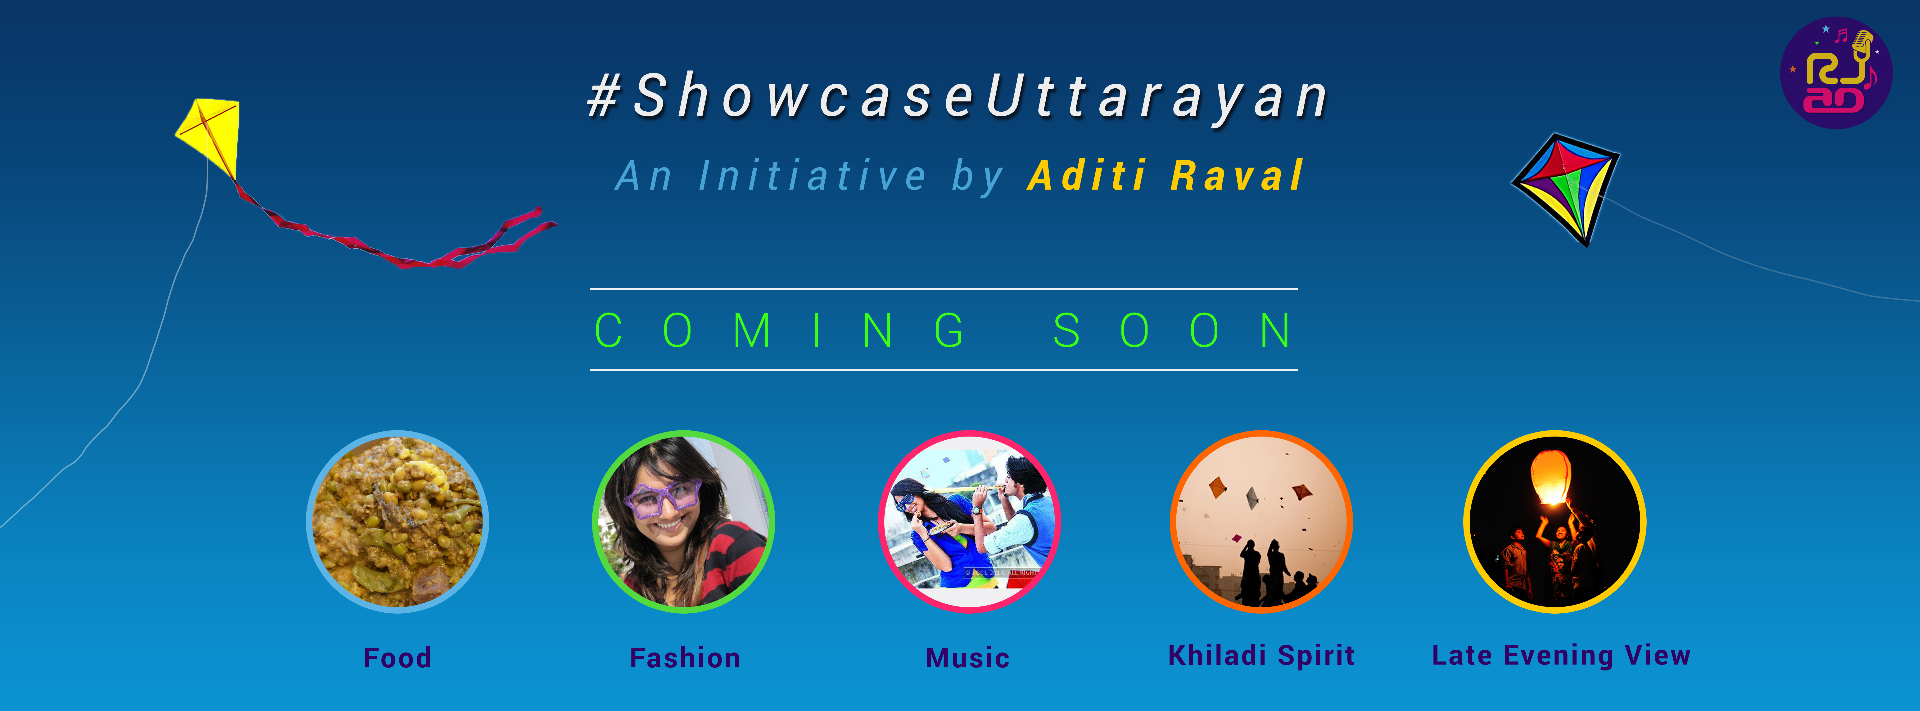 Showcase utrayan coming soon